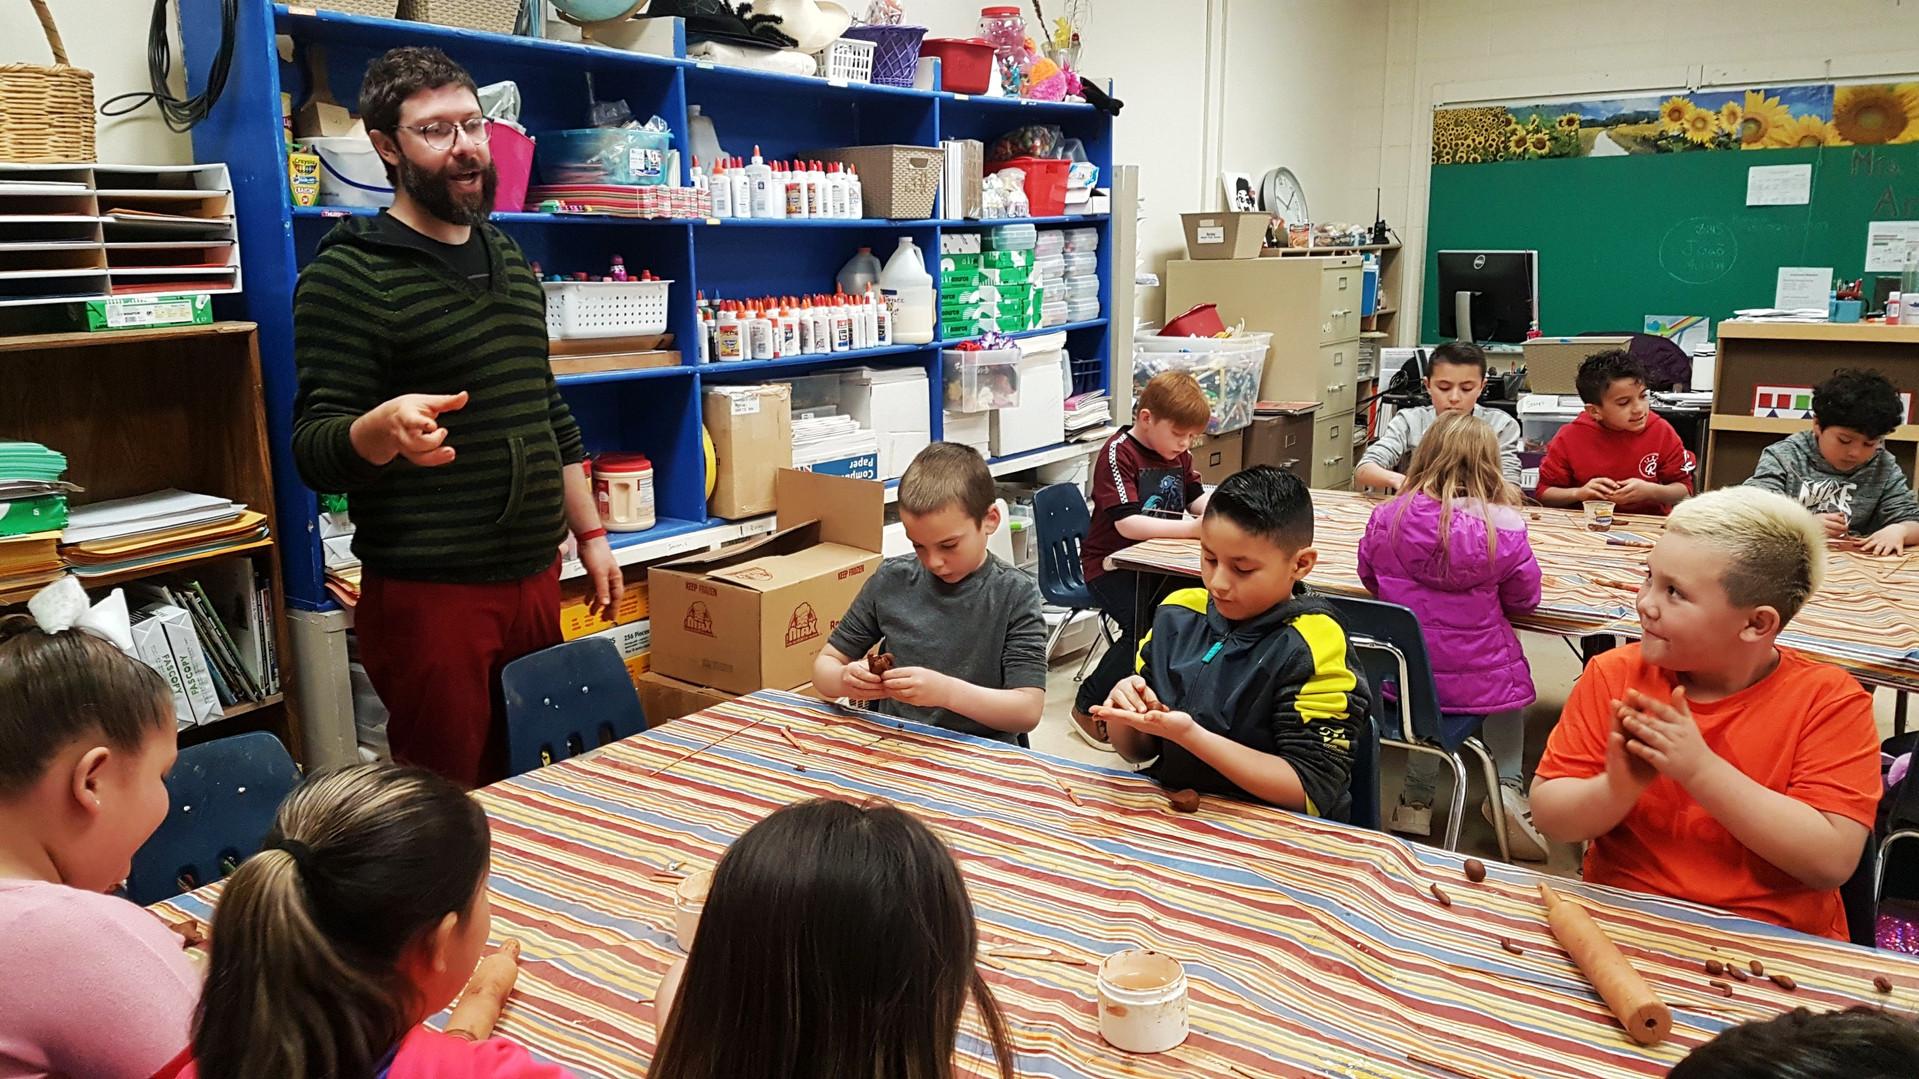 G W Stout Elementary School